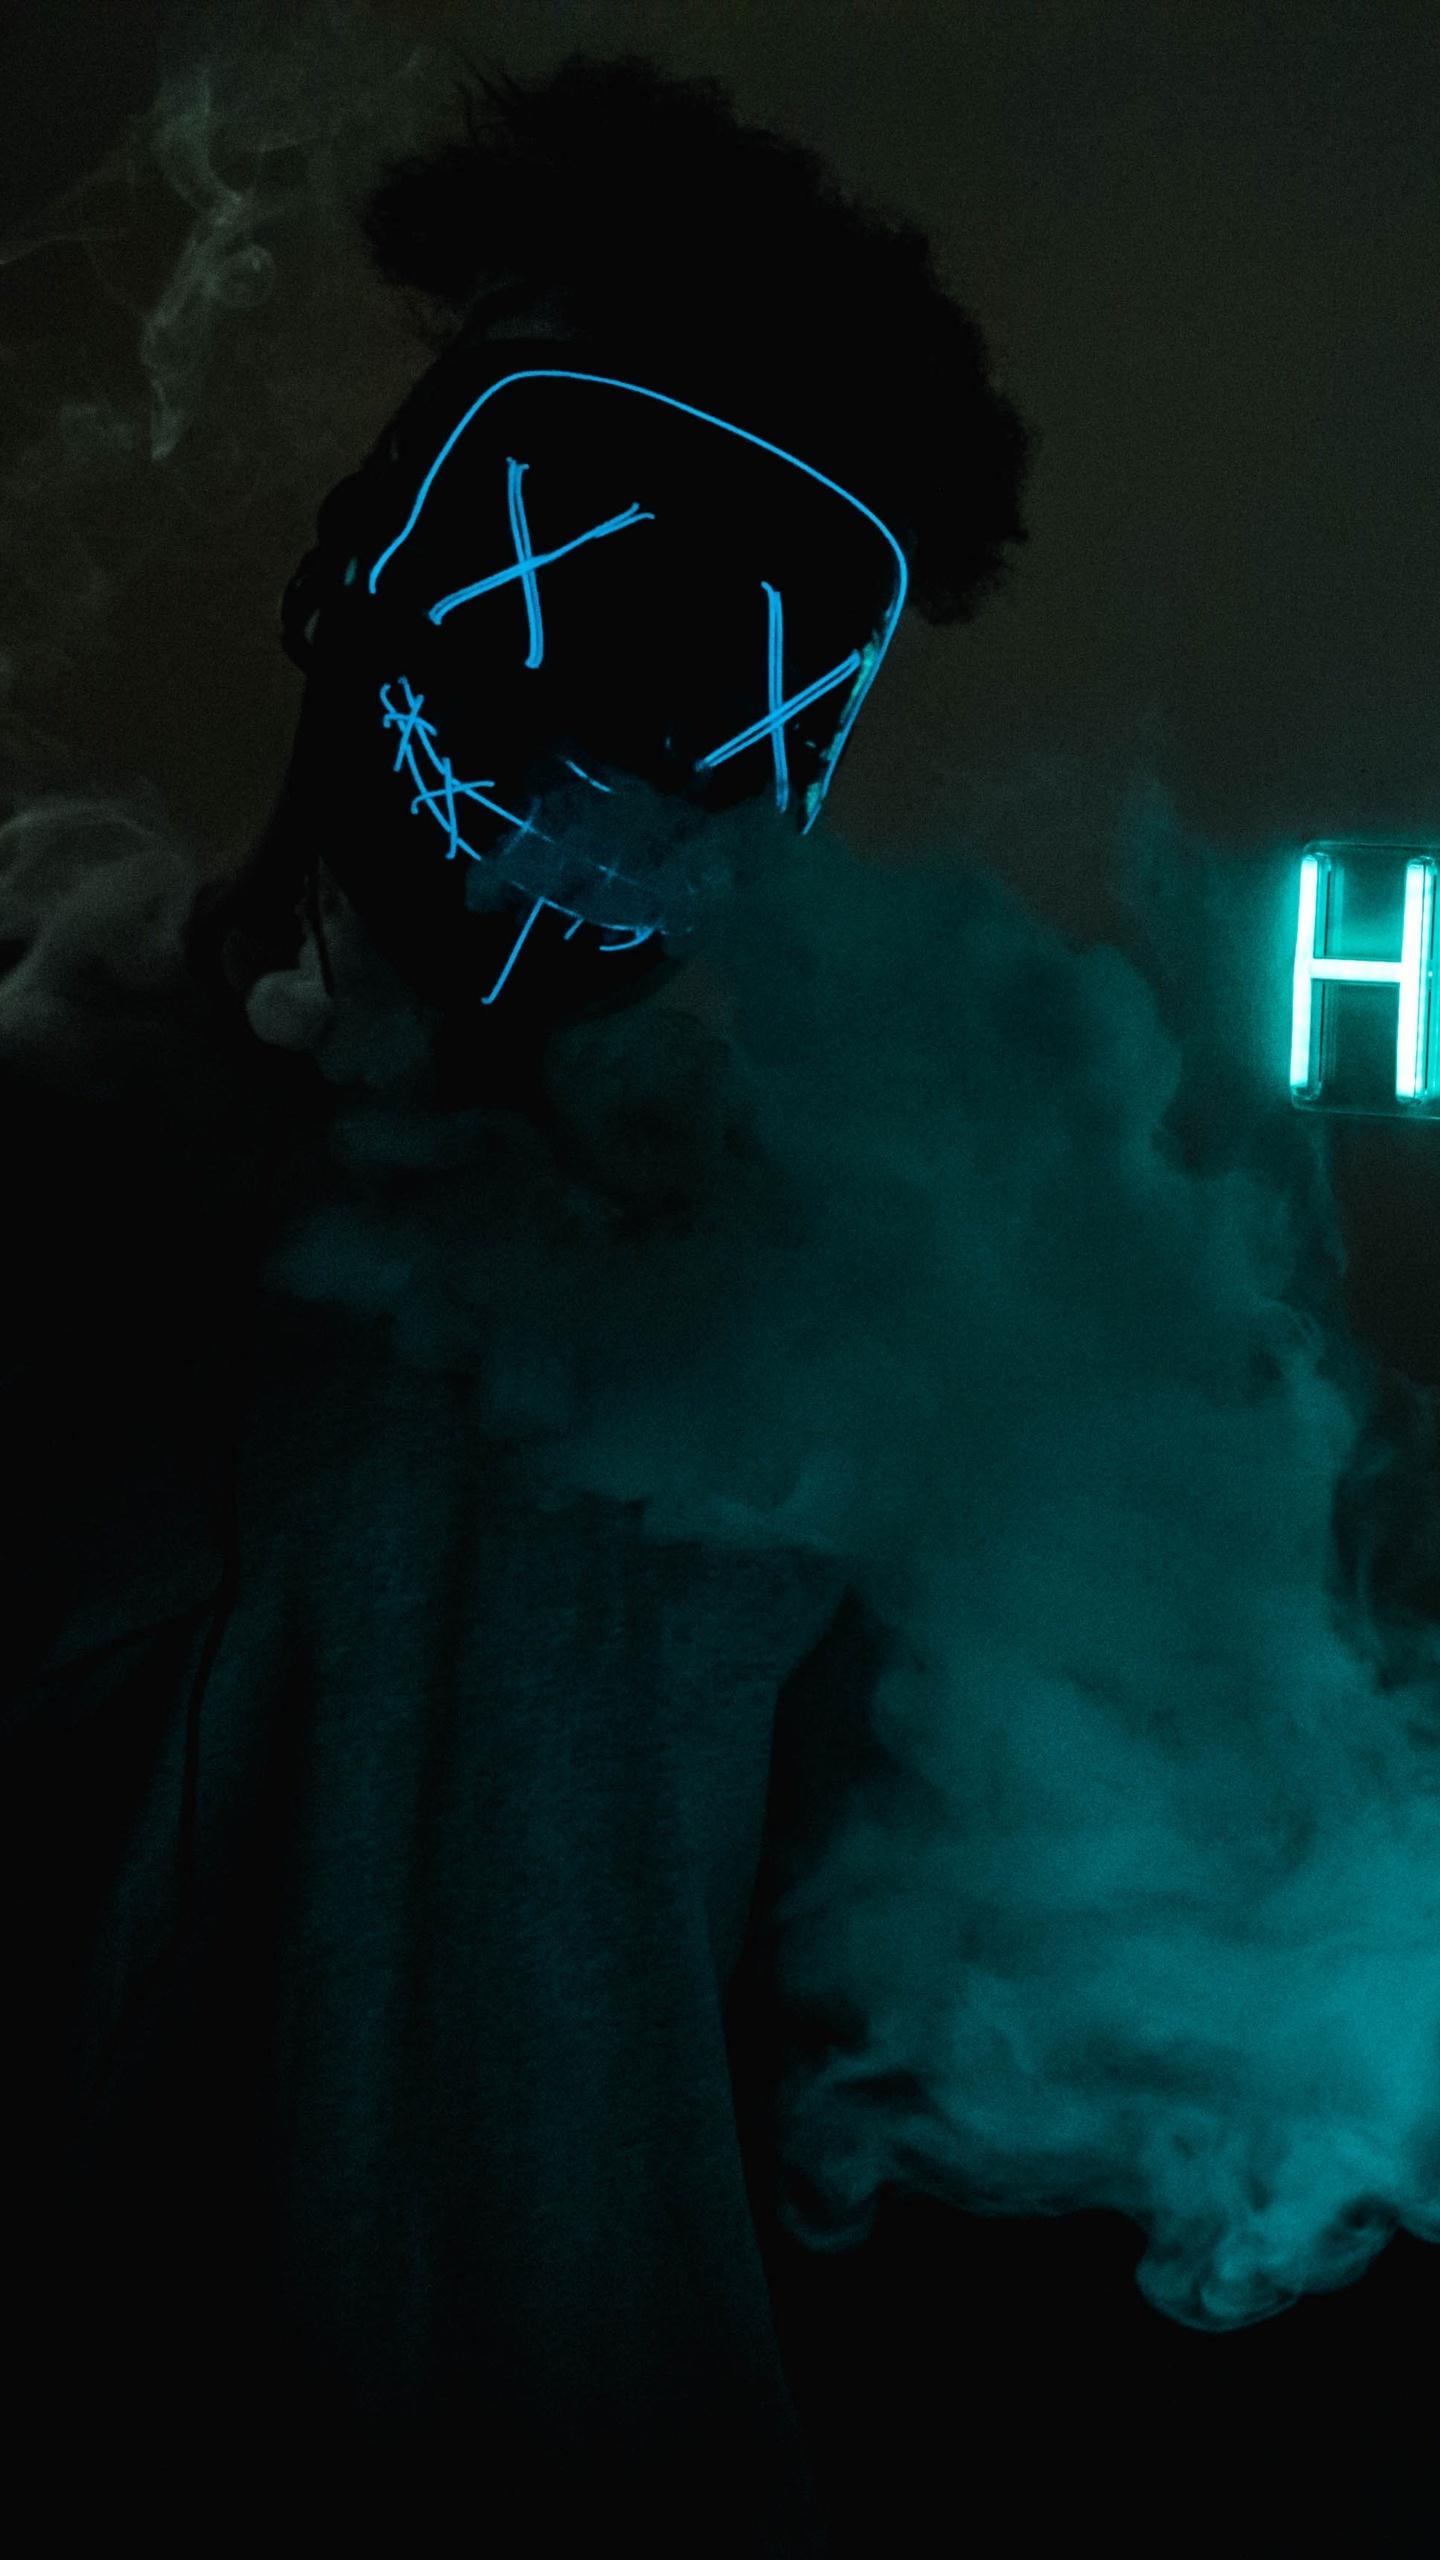 1440x2560 Mask Guy Hustle Neon Concept 5k Samsung Galaxy S6 S7